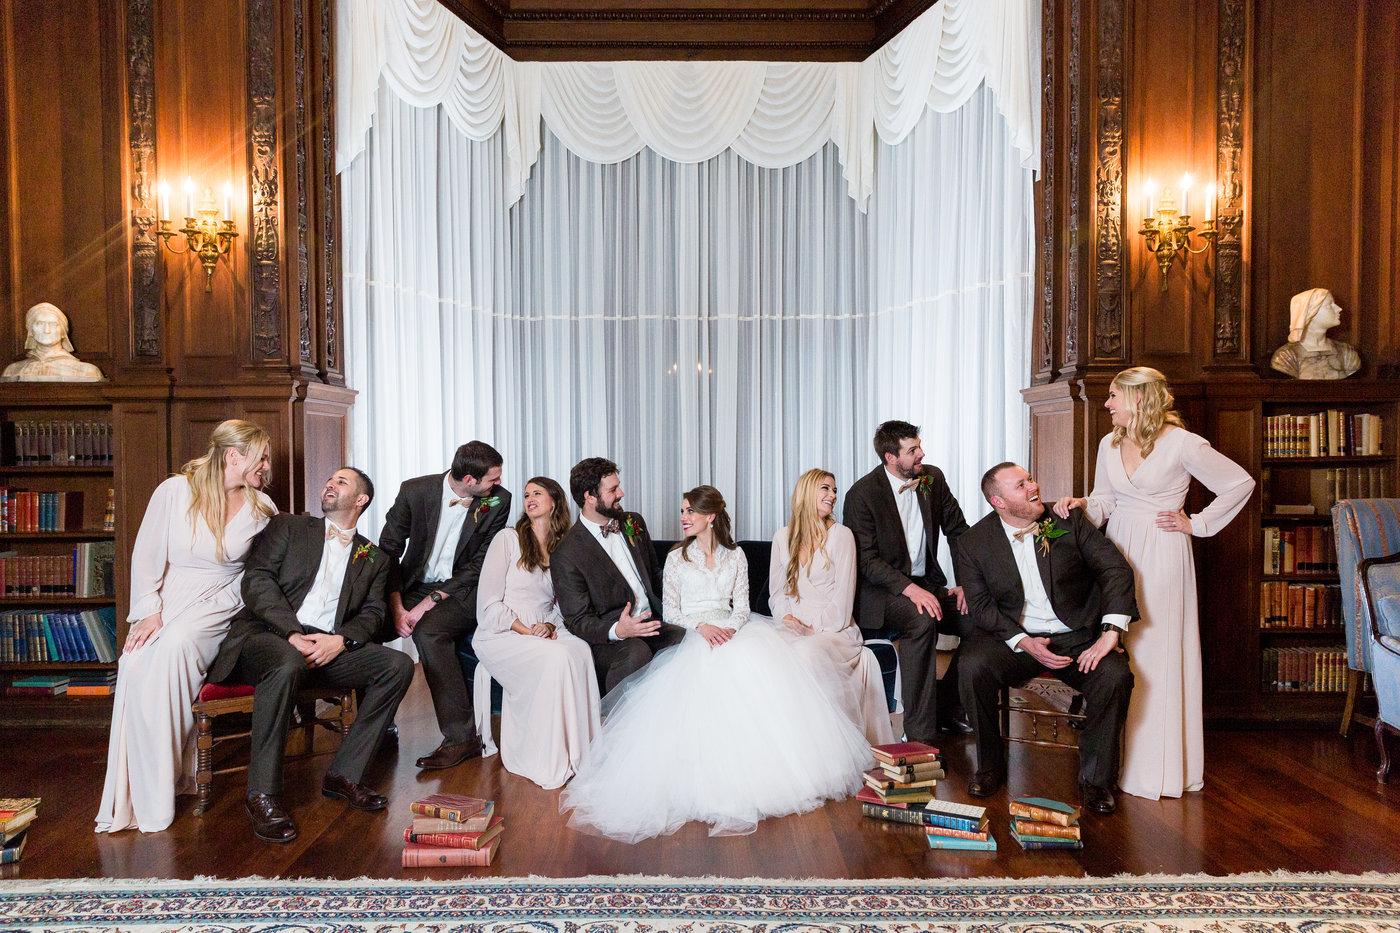 Palo-alto-wedding-photographer-captures-bridal-party-in-Kohl-Mansion.jpg